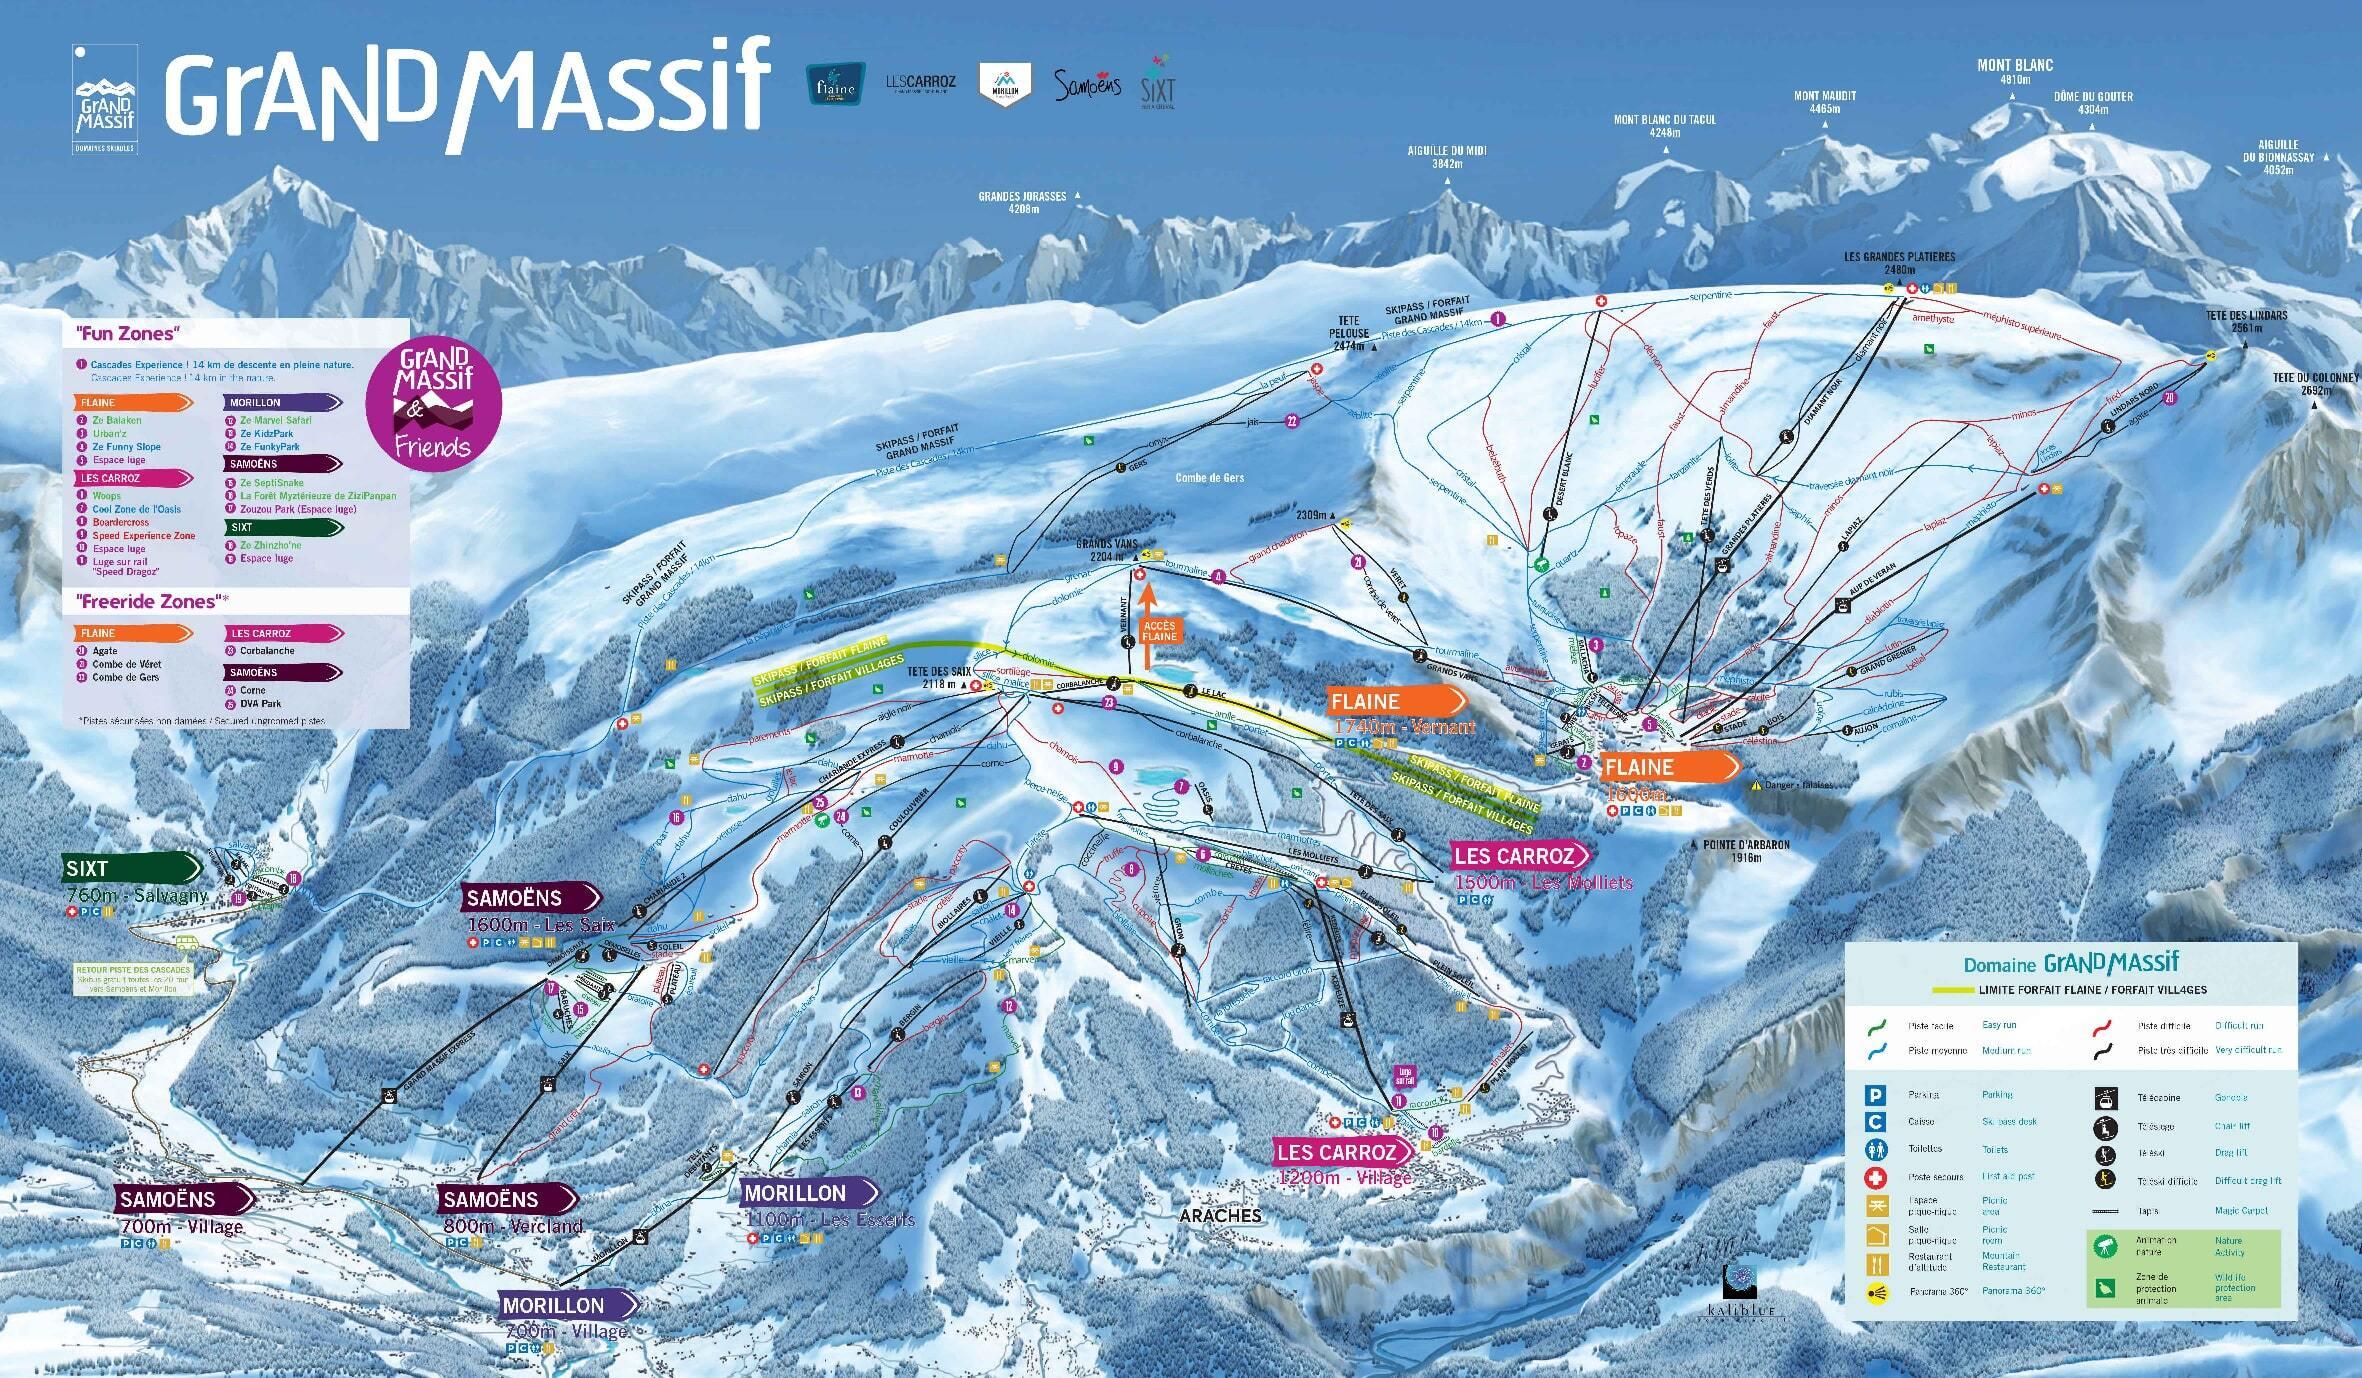 Flaine Ski Resort Guide Location Map Flaine ski holiday accommodation